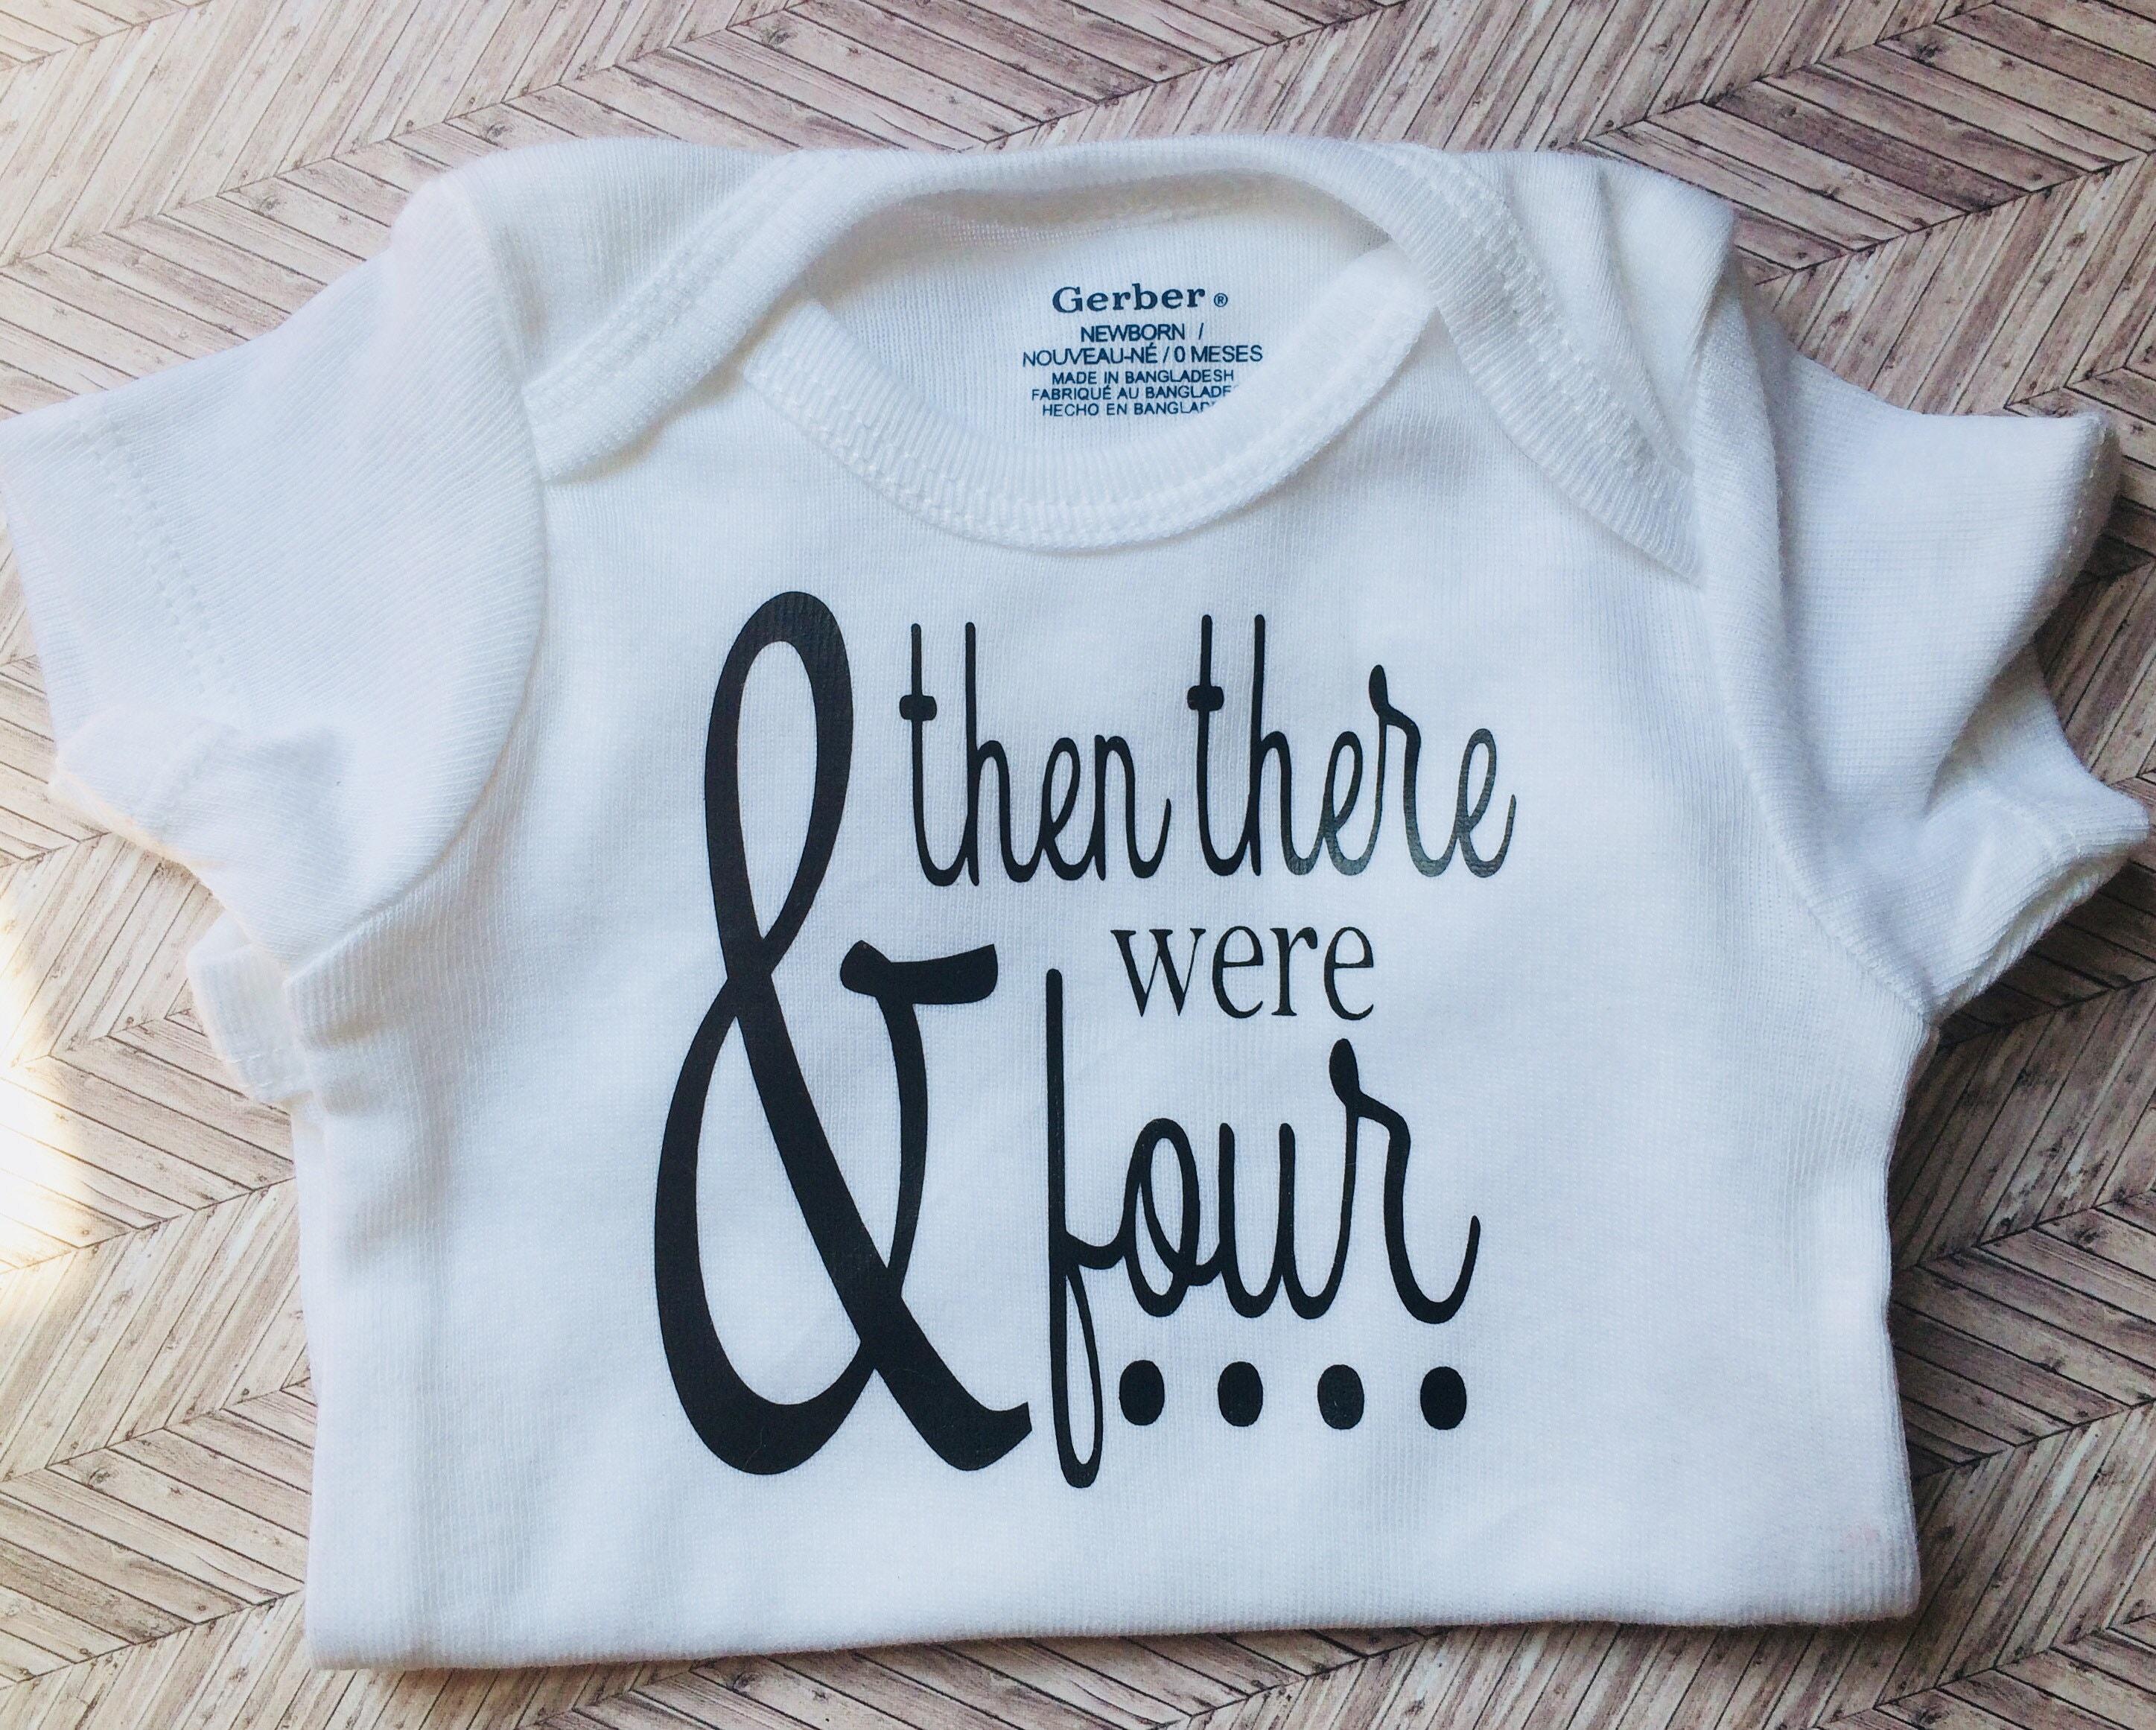 New Arrivalcustom Made T Shirtspersonalized Baby T Shirtcustom Baby Shirtdesign Your Own T Shirtbaby Snap Shirt